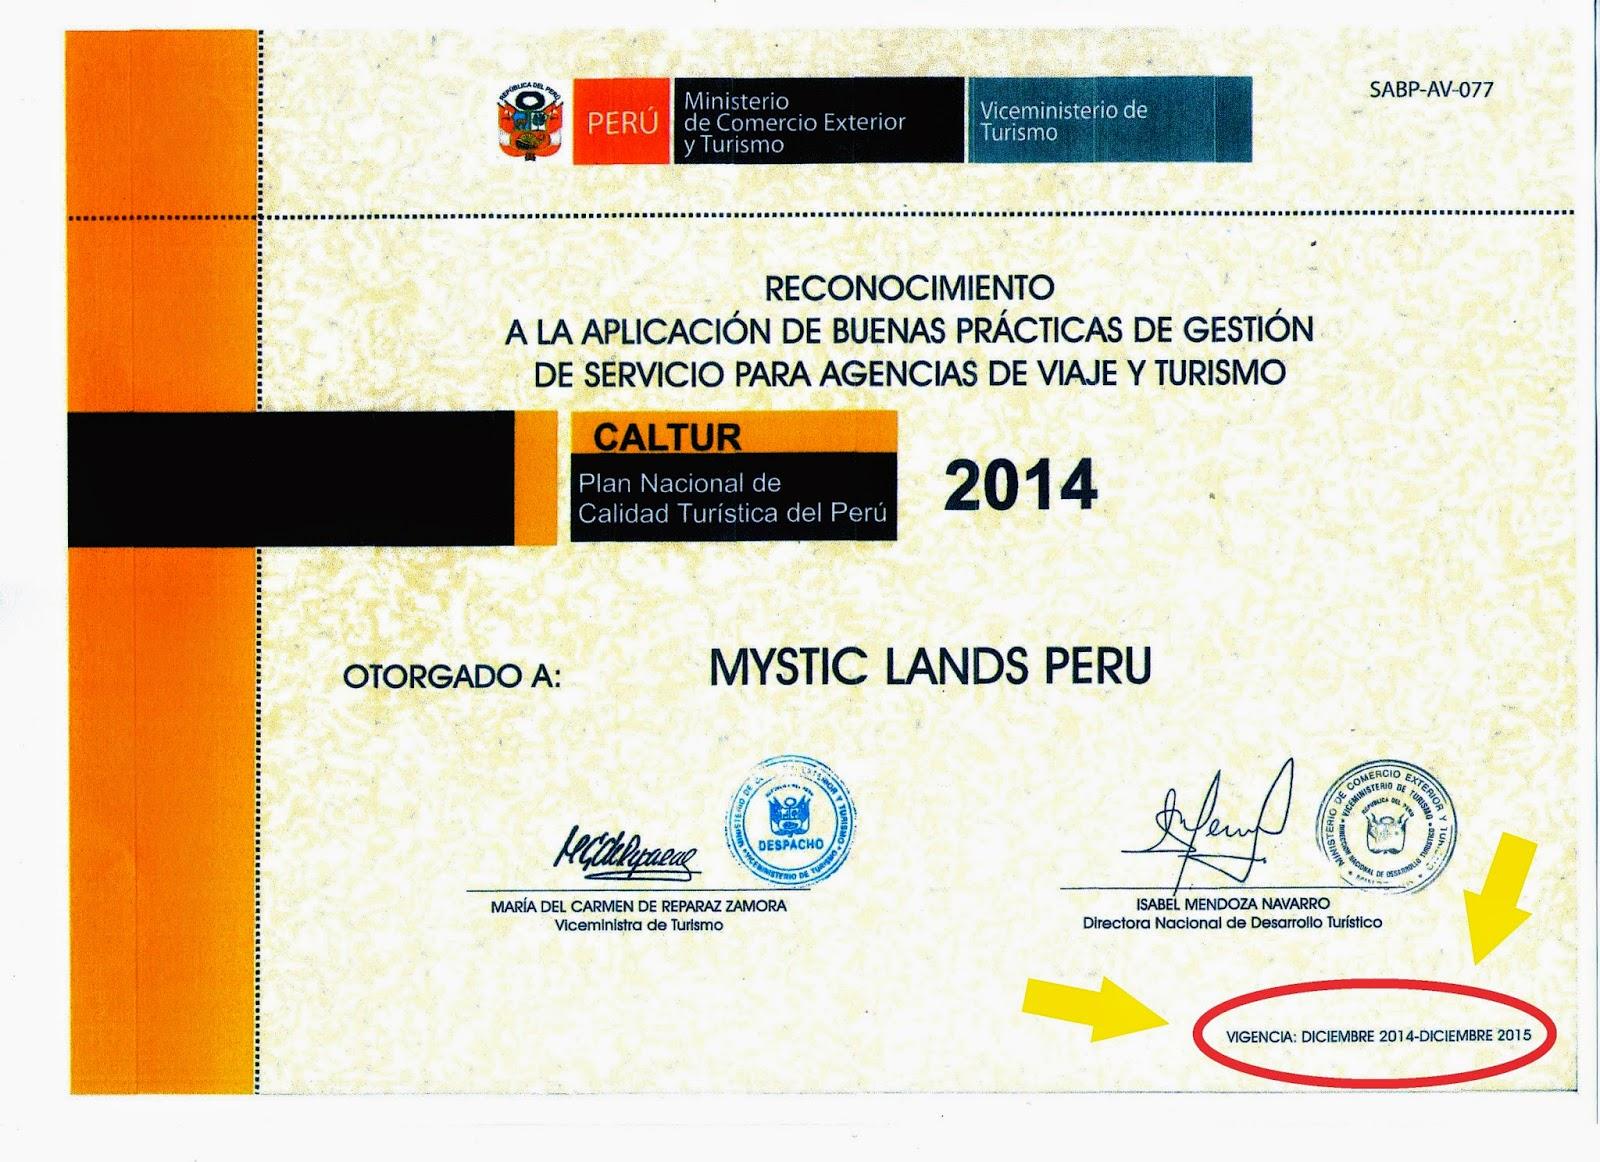 Agencia de viajes Premiada cusco 2016